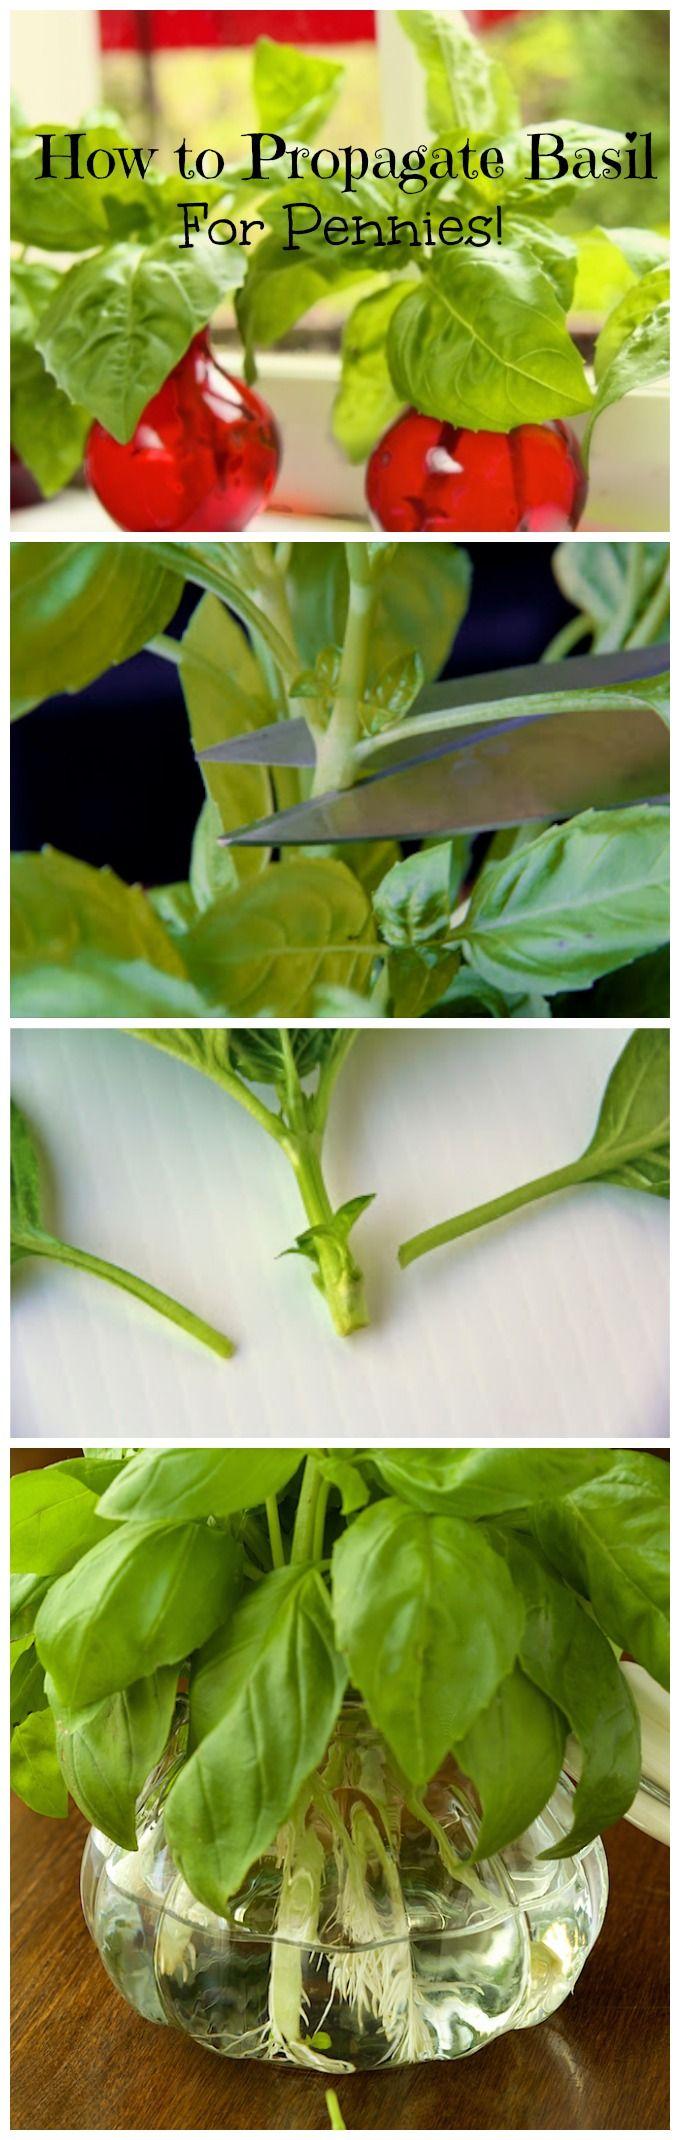 how to easily propagate basil from cuttings gardening garden edible garden herb garden. Black Bedroom Furniture Sets. Home Design Ideas